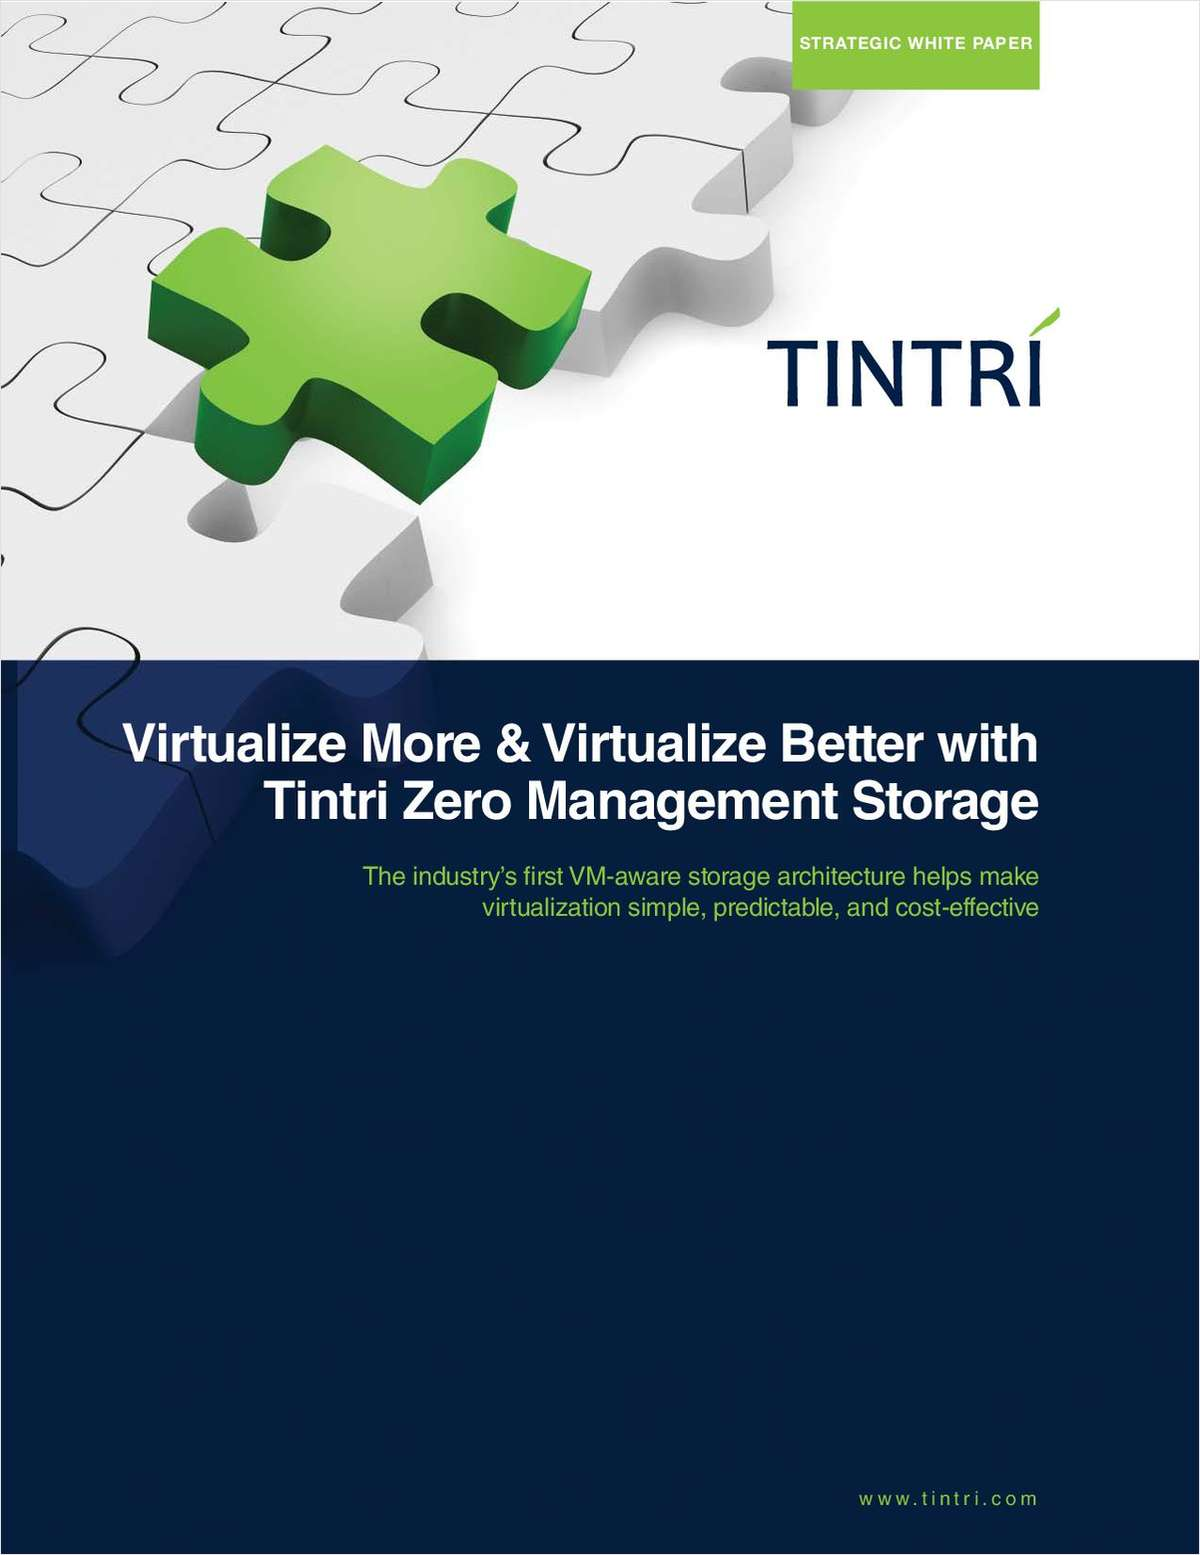 Virtualize More & Virtualize Better with Tintri Zero Management Storage